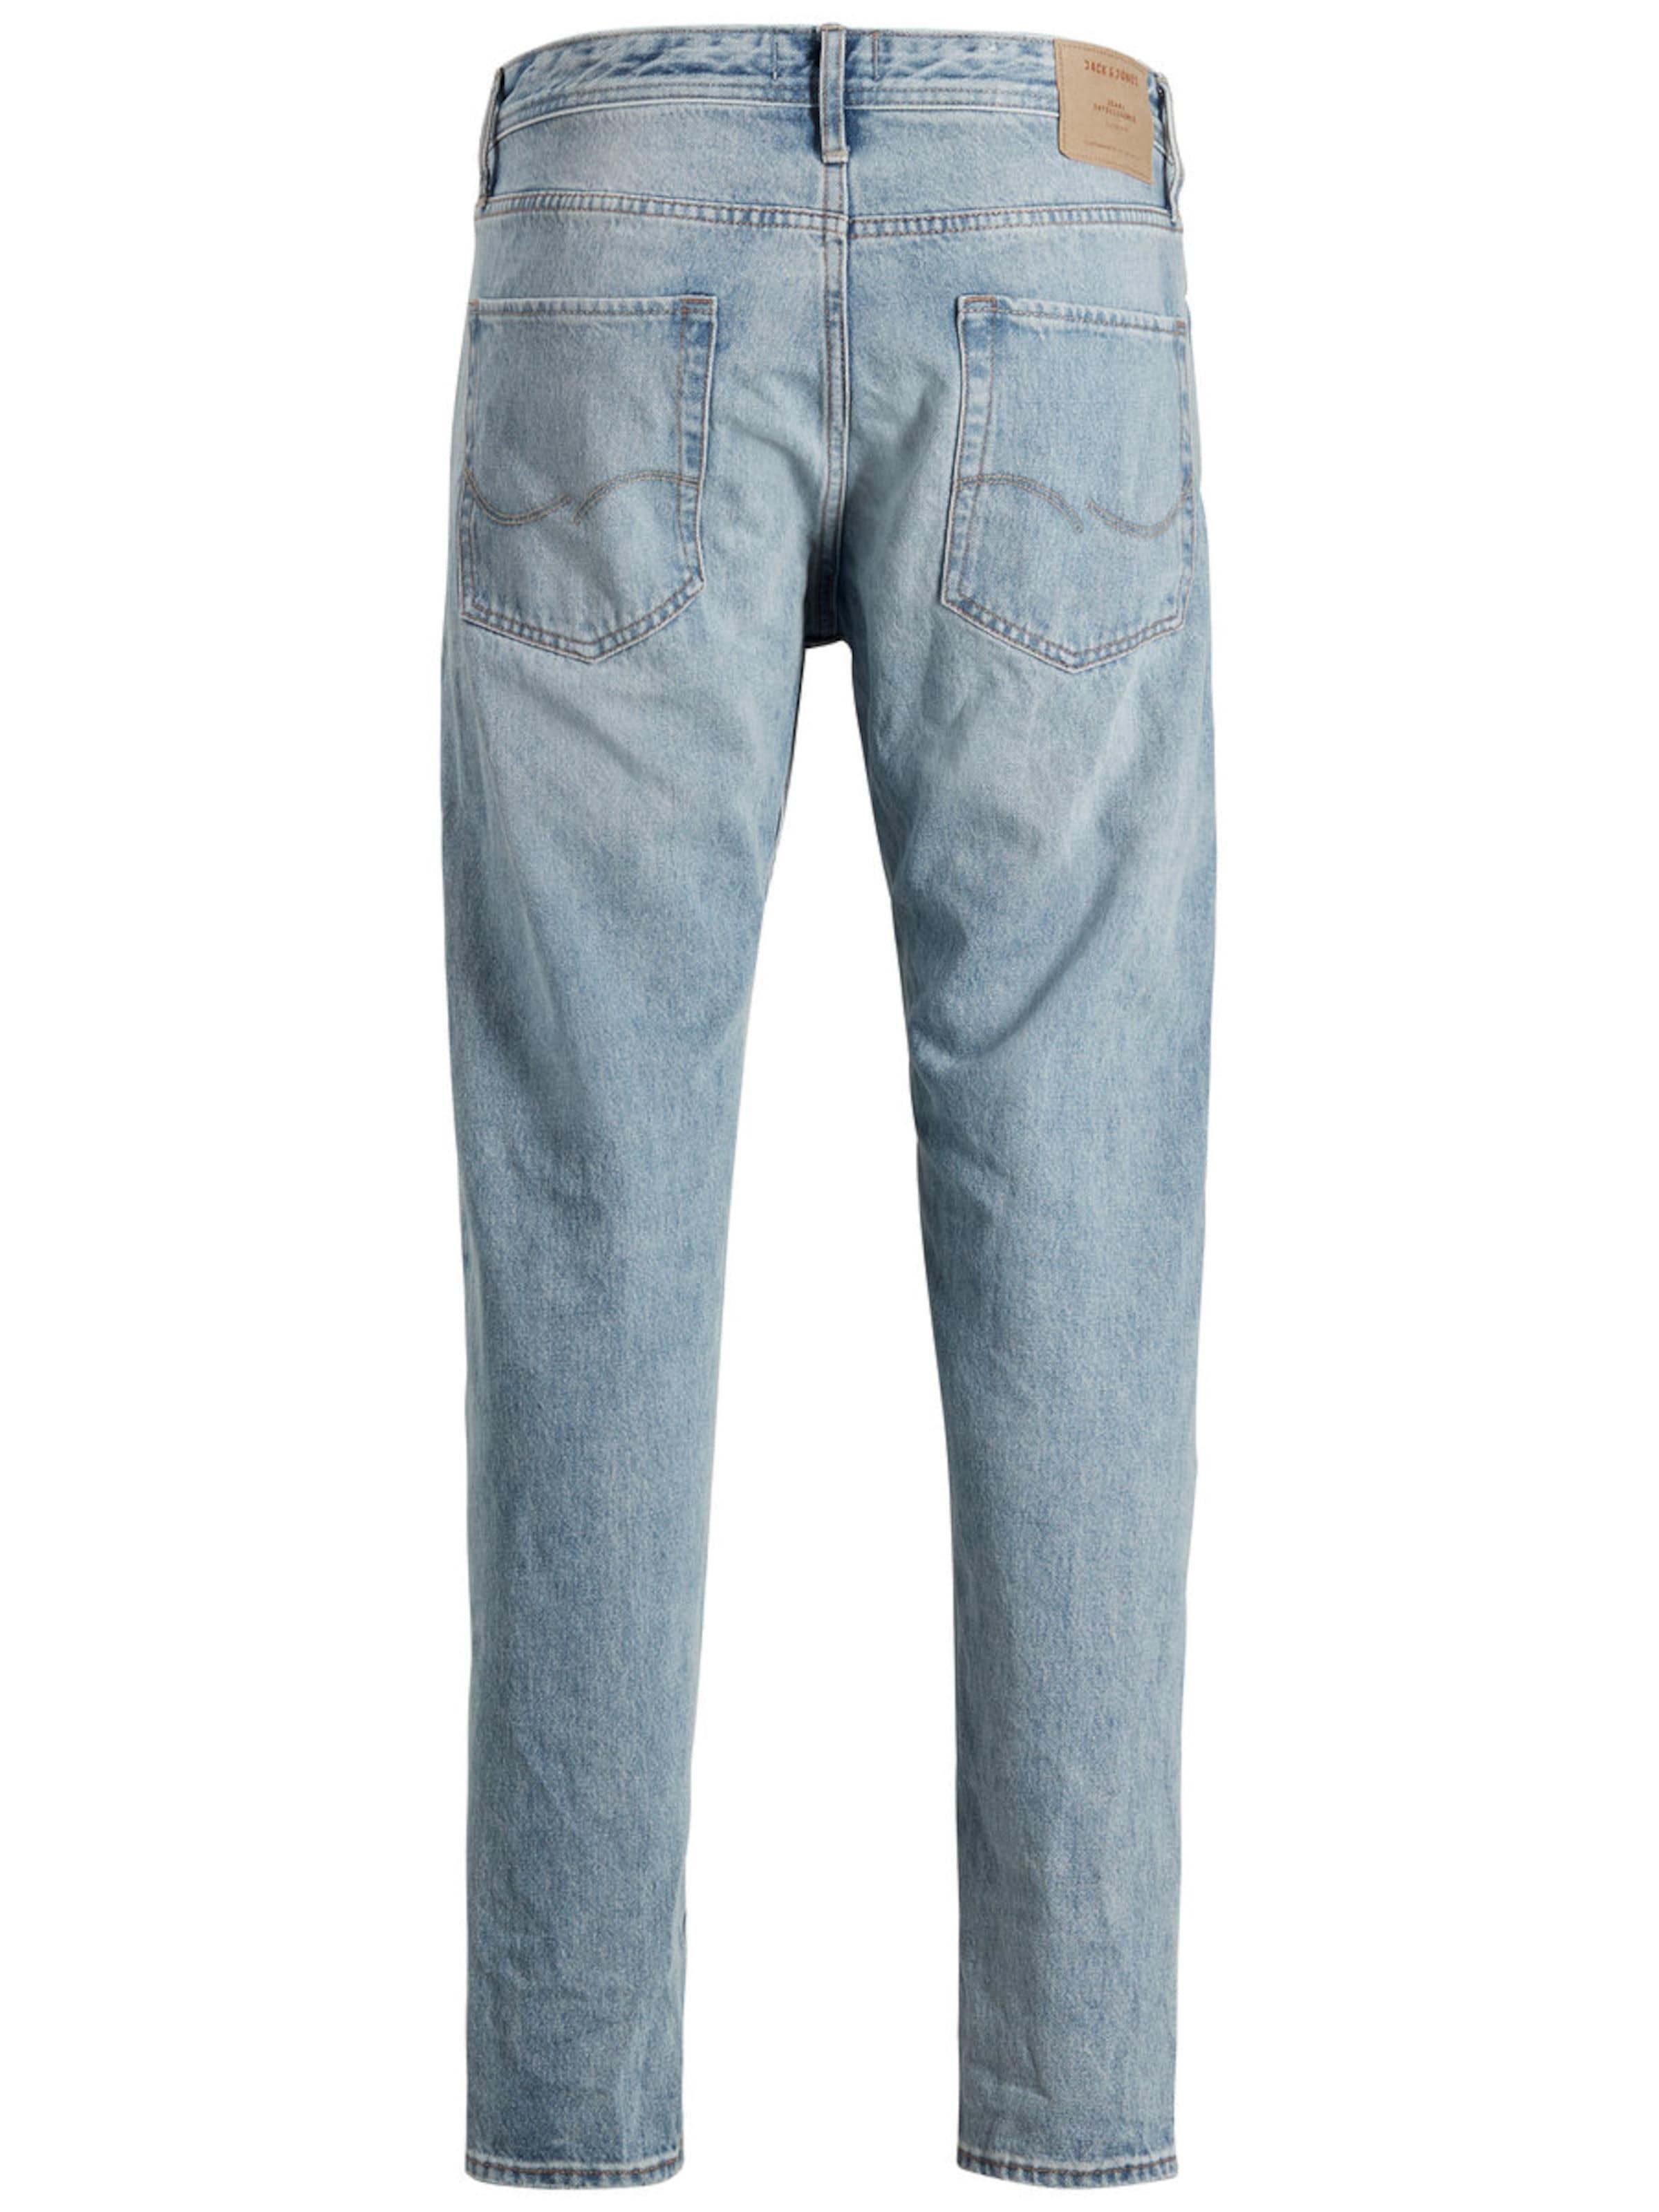 Rabatt Verkauf JACK & JONES 'FRED ORIGINAL CR 033 STS' Anti Fit Jeans Günstig Kaufen Nicekicks Countdown-Paket Zum Verkauf thhj122